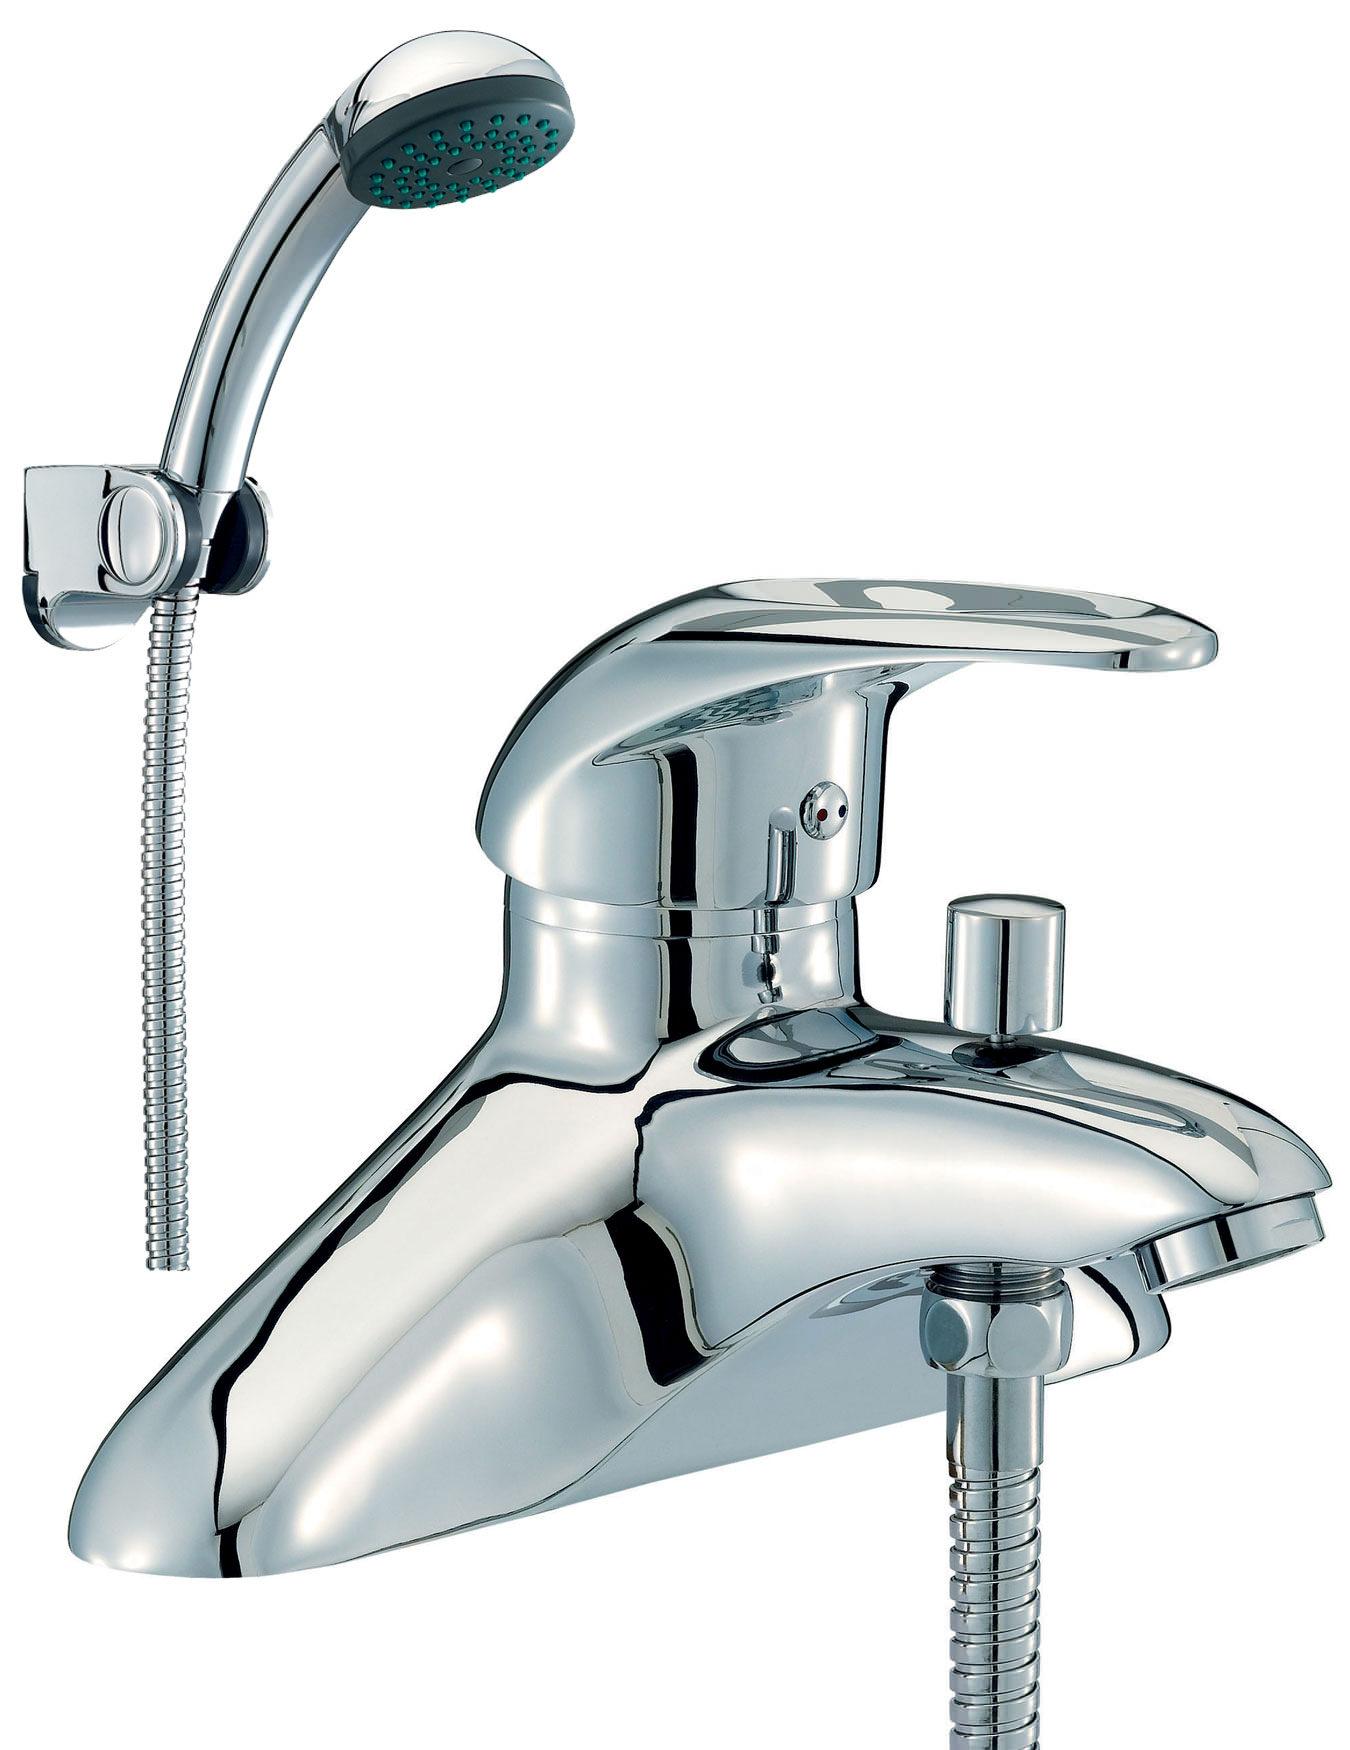 Bath Taps: Mayfair Jet Bath Shower Mixer Tap With Shower Kit Chrome